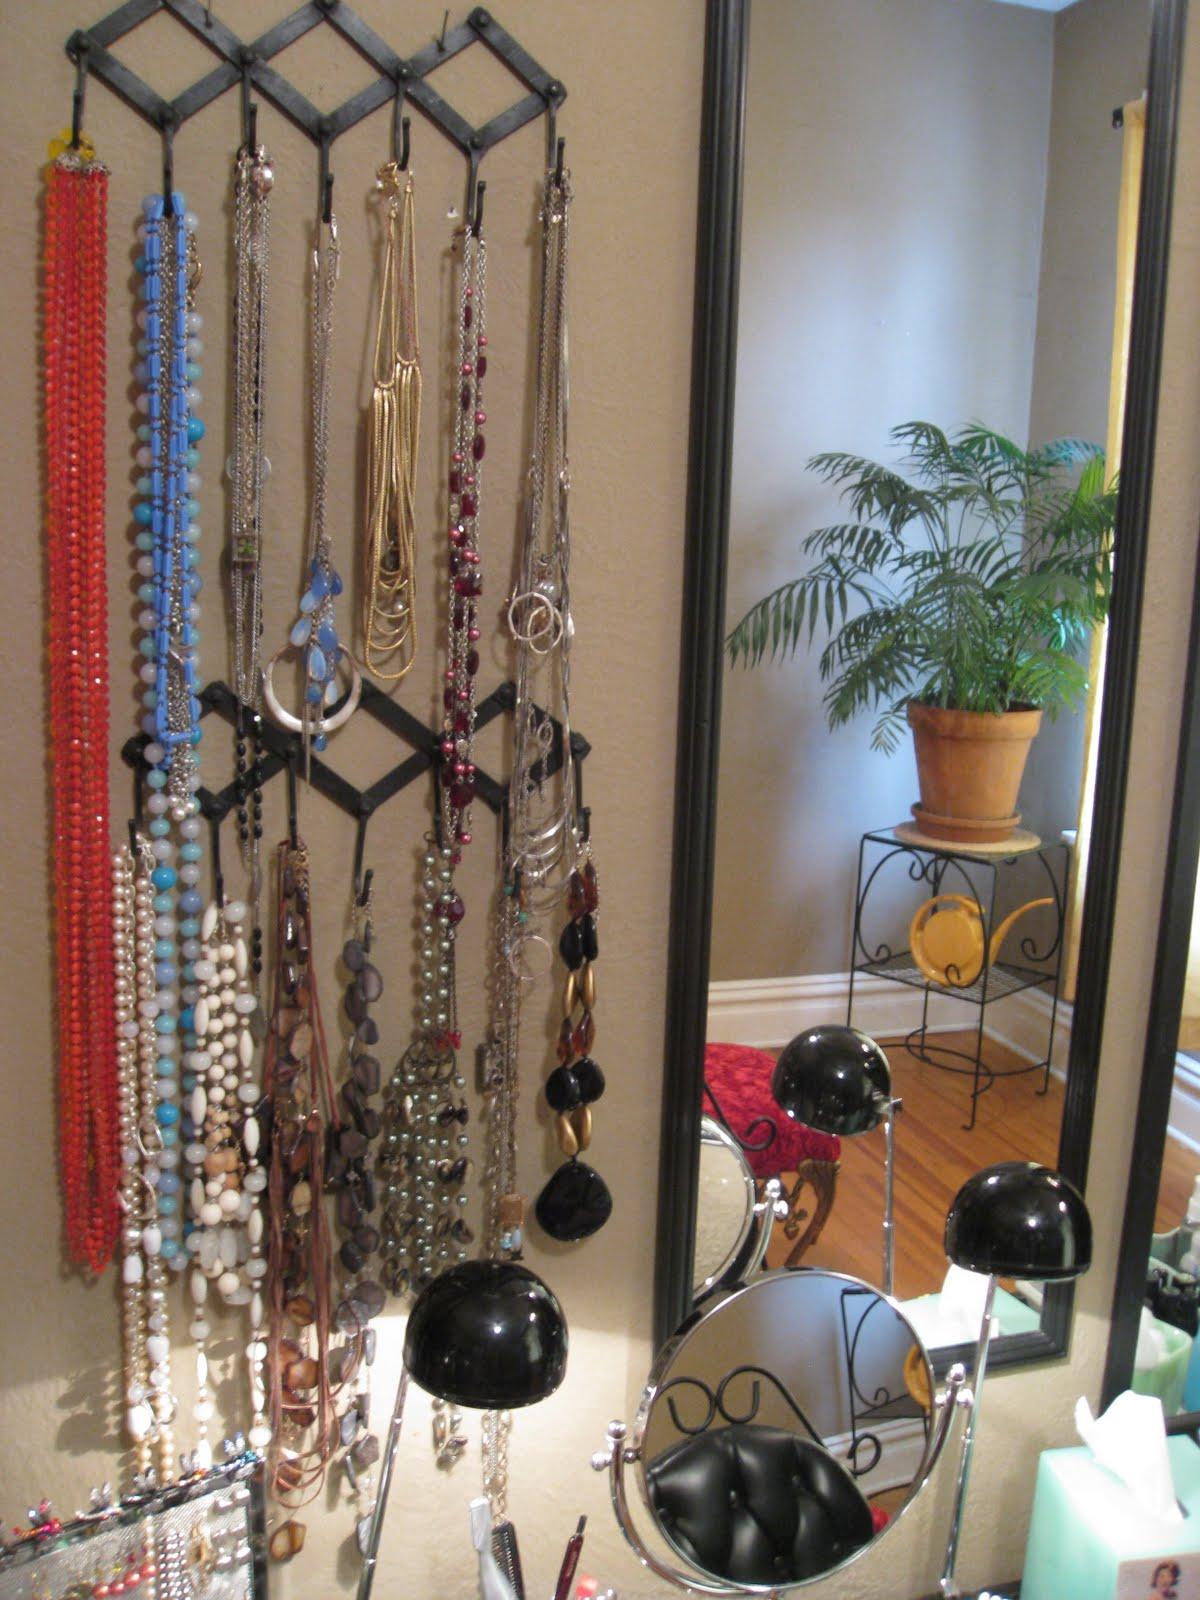 Squeaky Chic Jewelry Organization Ideas